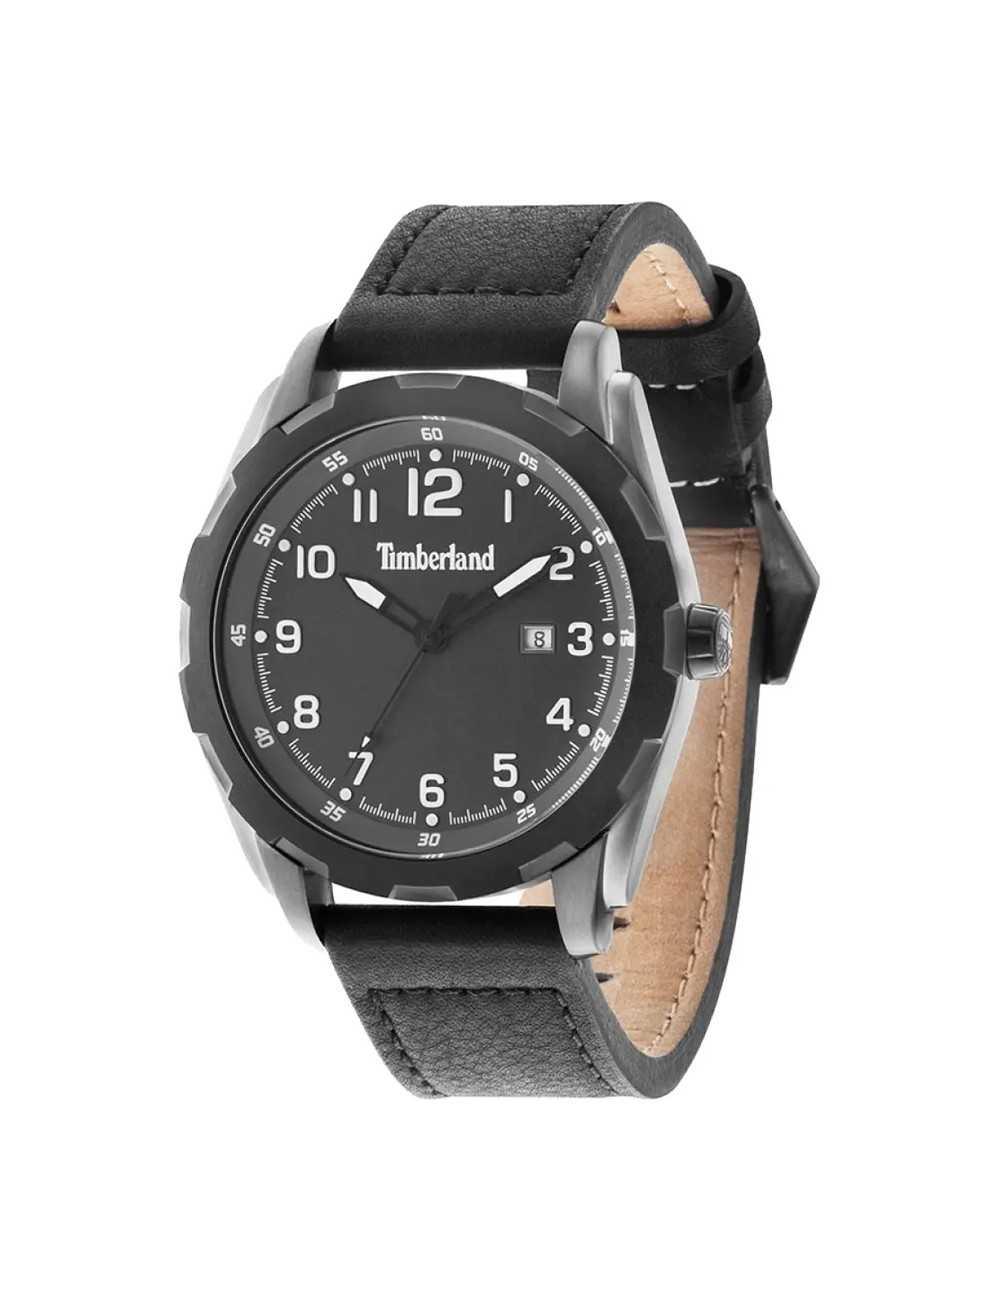 Pánske hodinky Timberland Newmarket TBL.13330XSUB / 61A